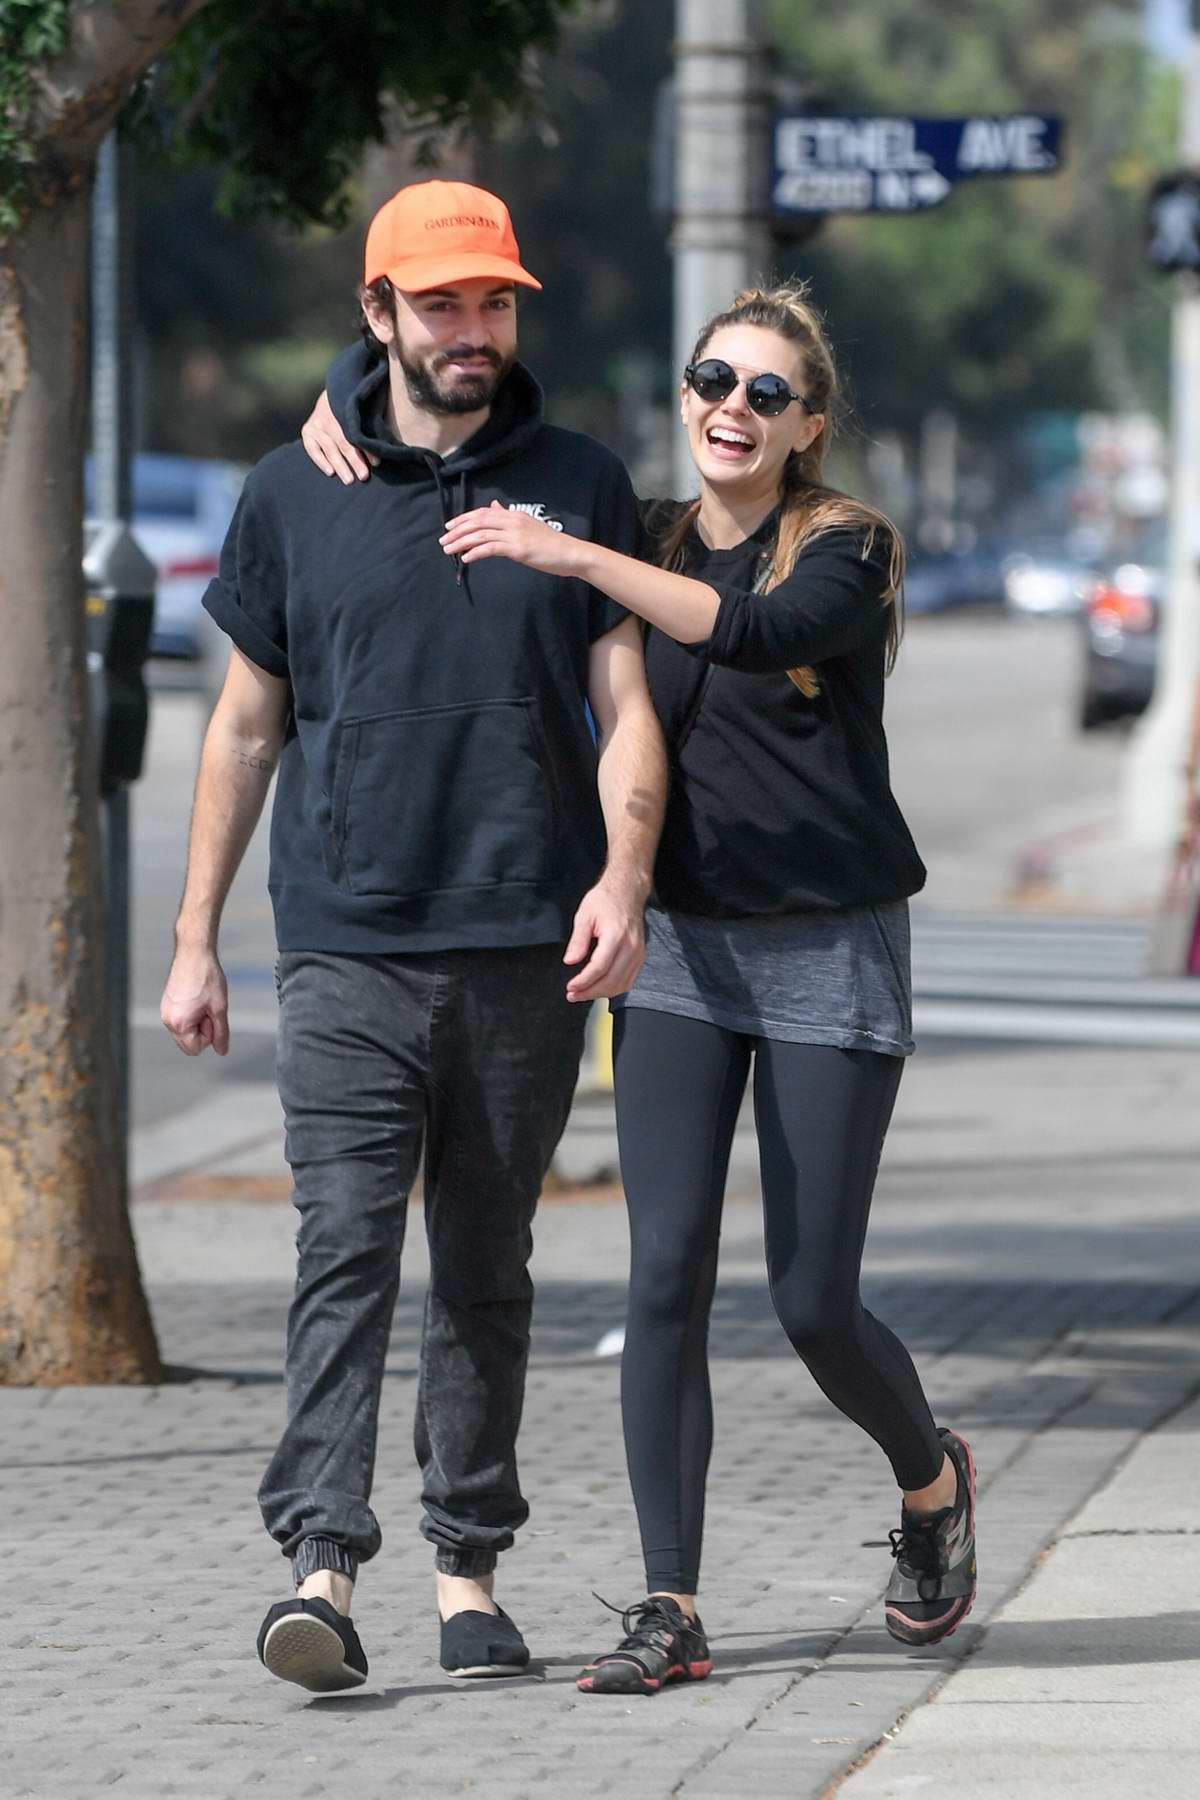 Elizabeth Olsen packs on some PDA with her musician boyfriend Robbie Arnett in Los Angeles